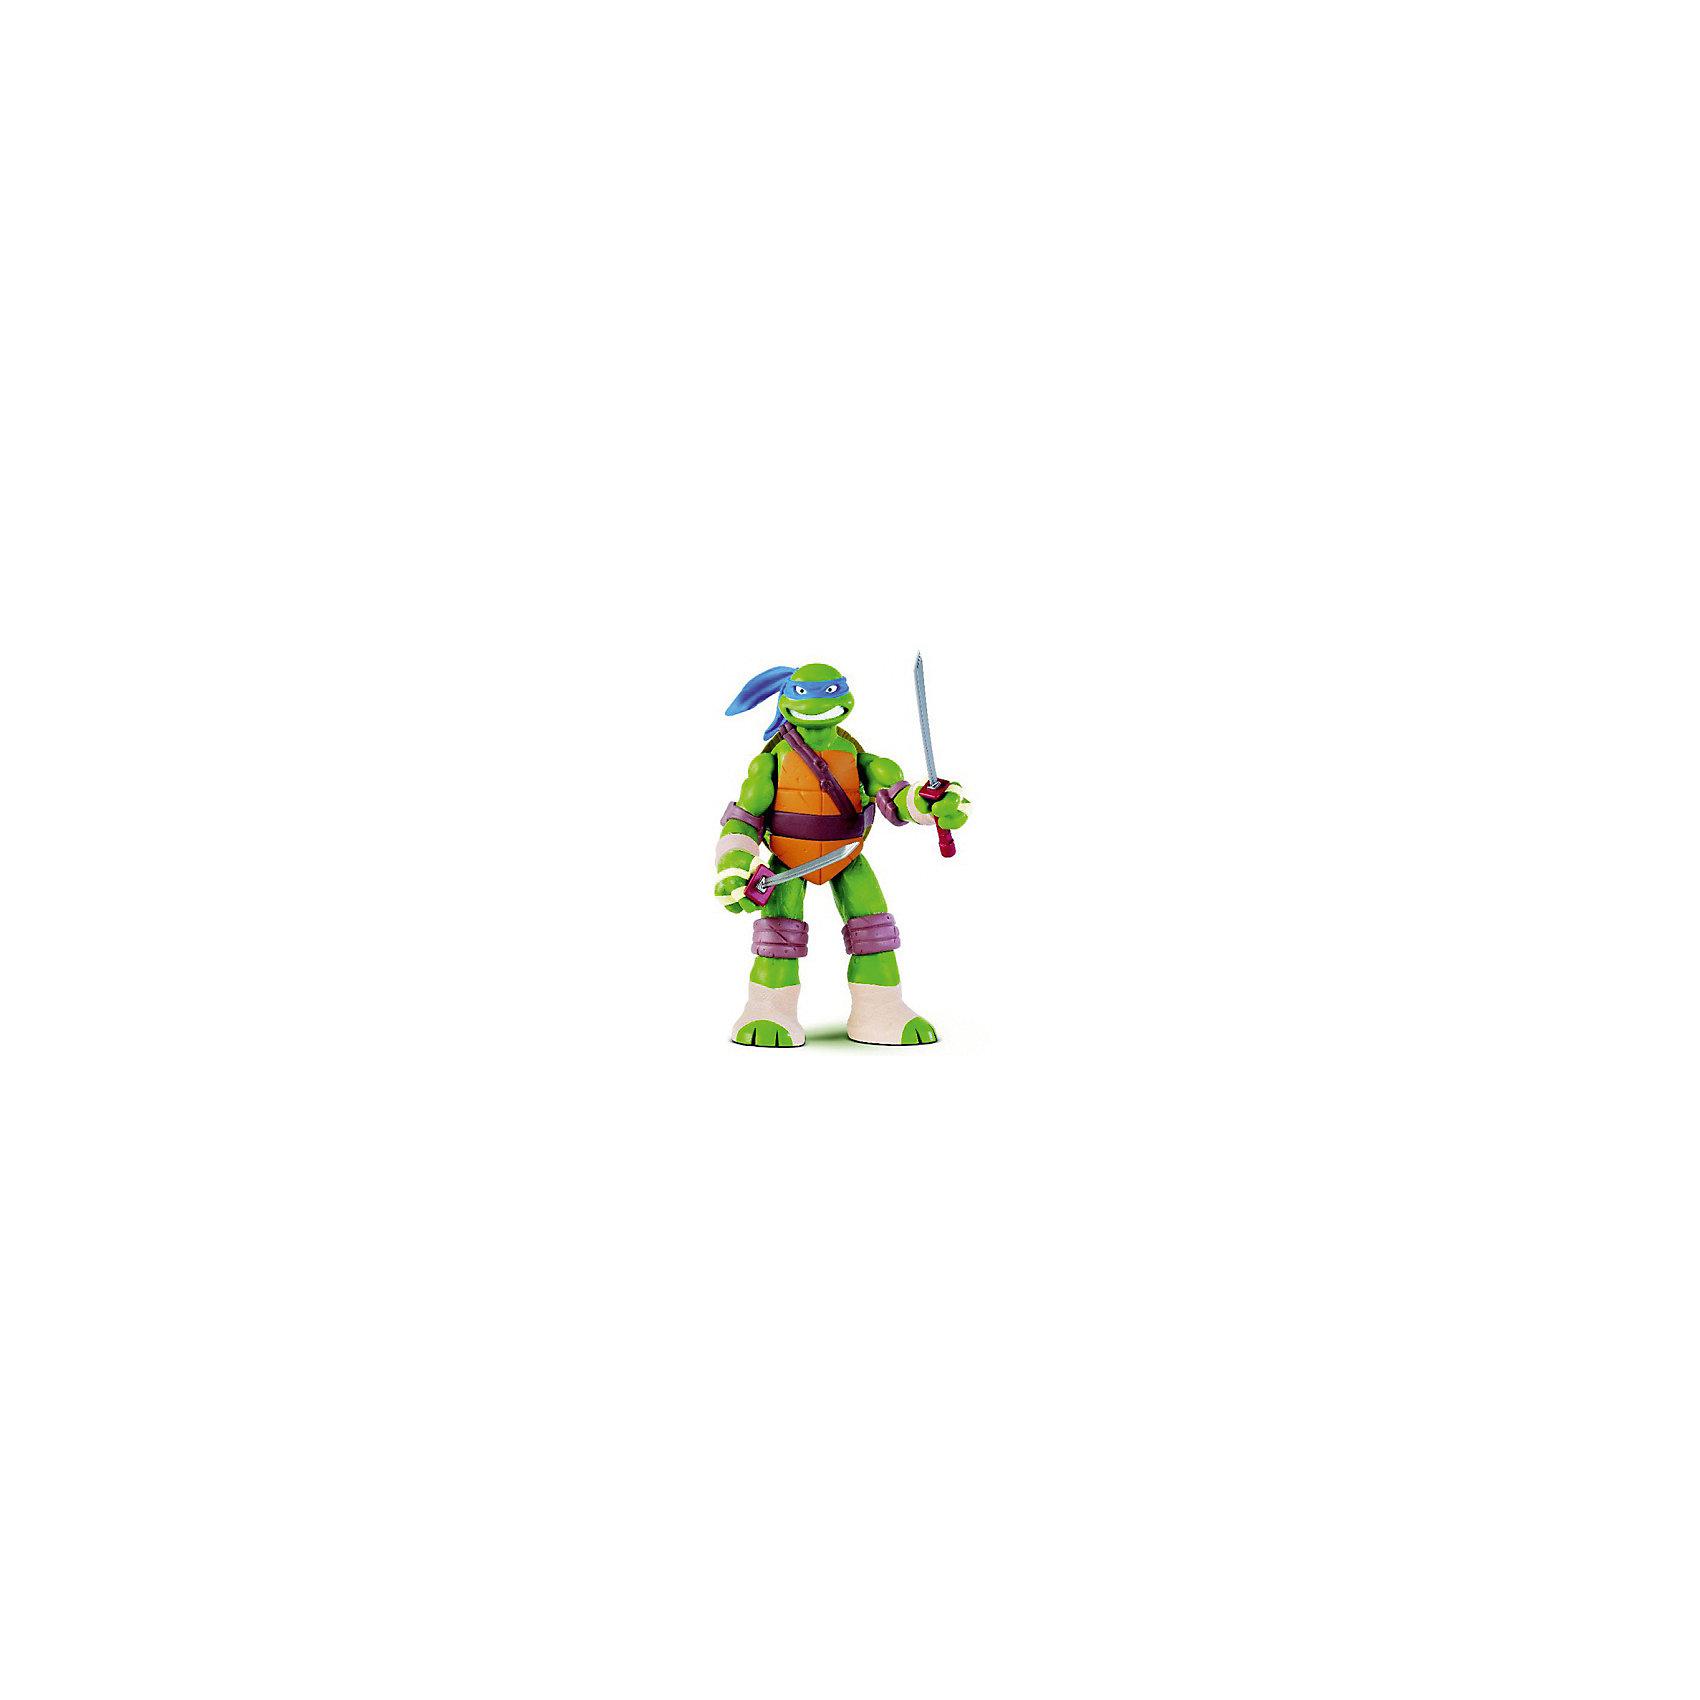 - Фигурка Леонардо, 28см, Черепашки Ниндзя фигурка леонардо 15 см черепашки ниндзя